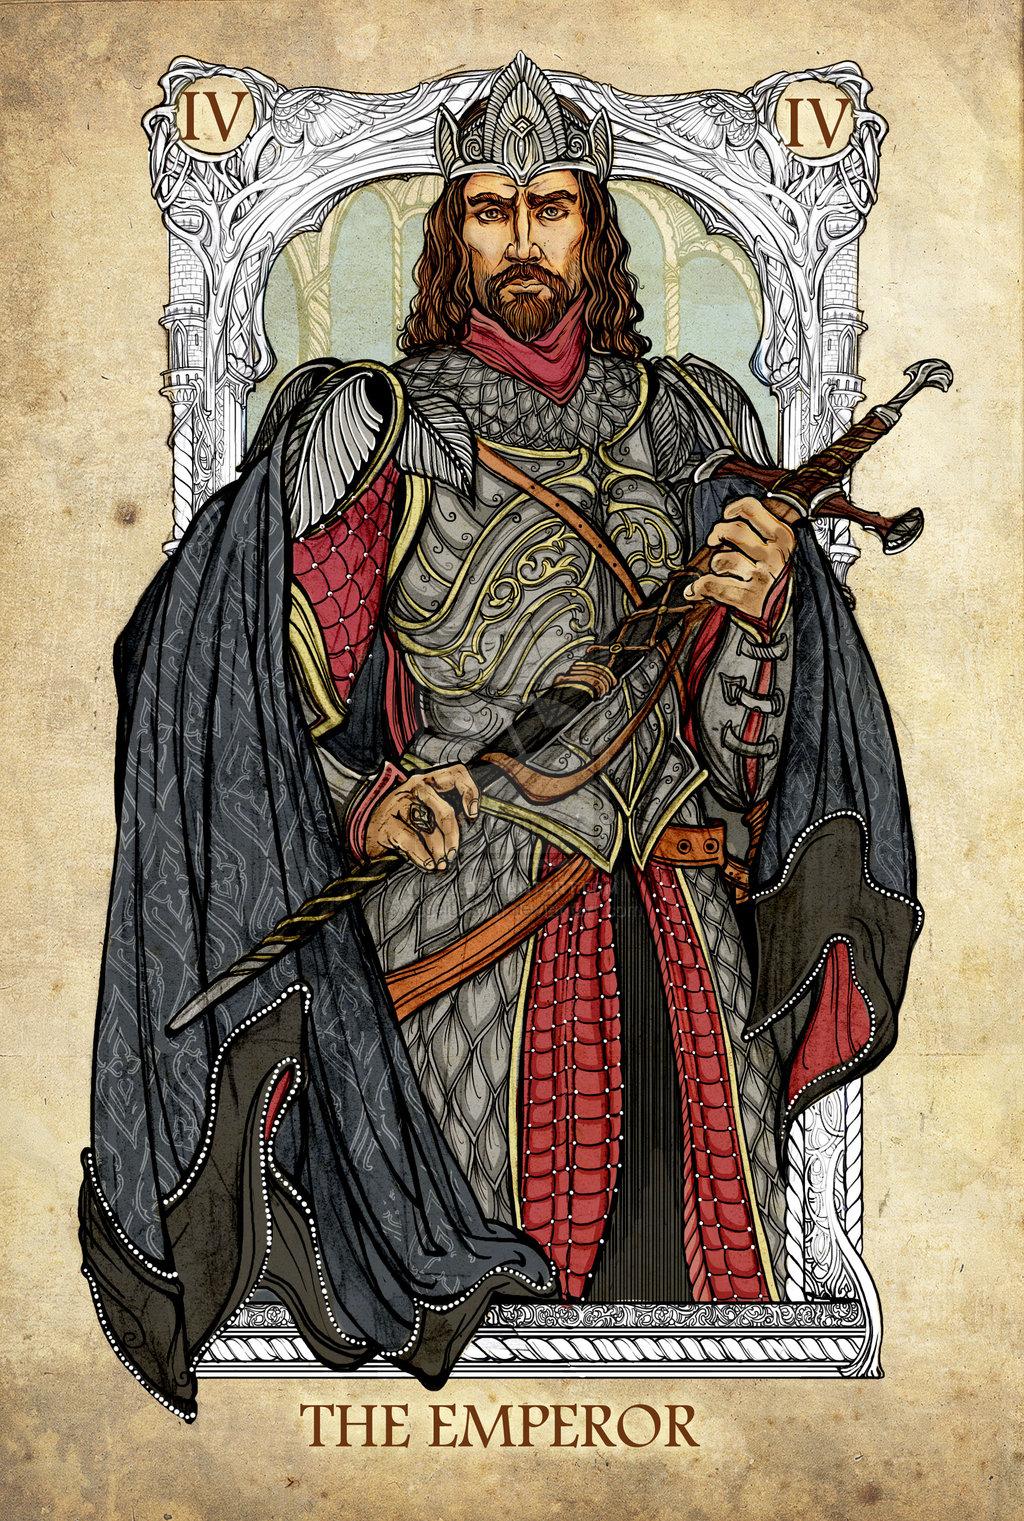 tarot__the_emperor_by_sceithailm-d5ycf6w